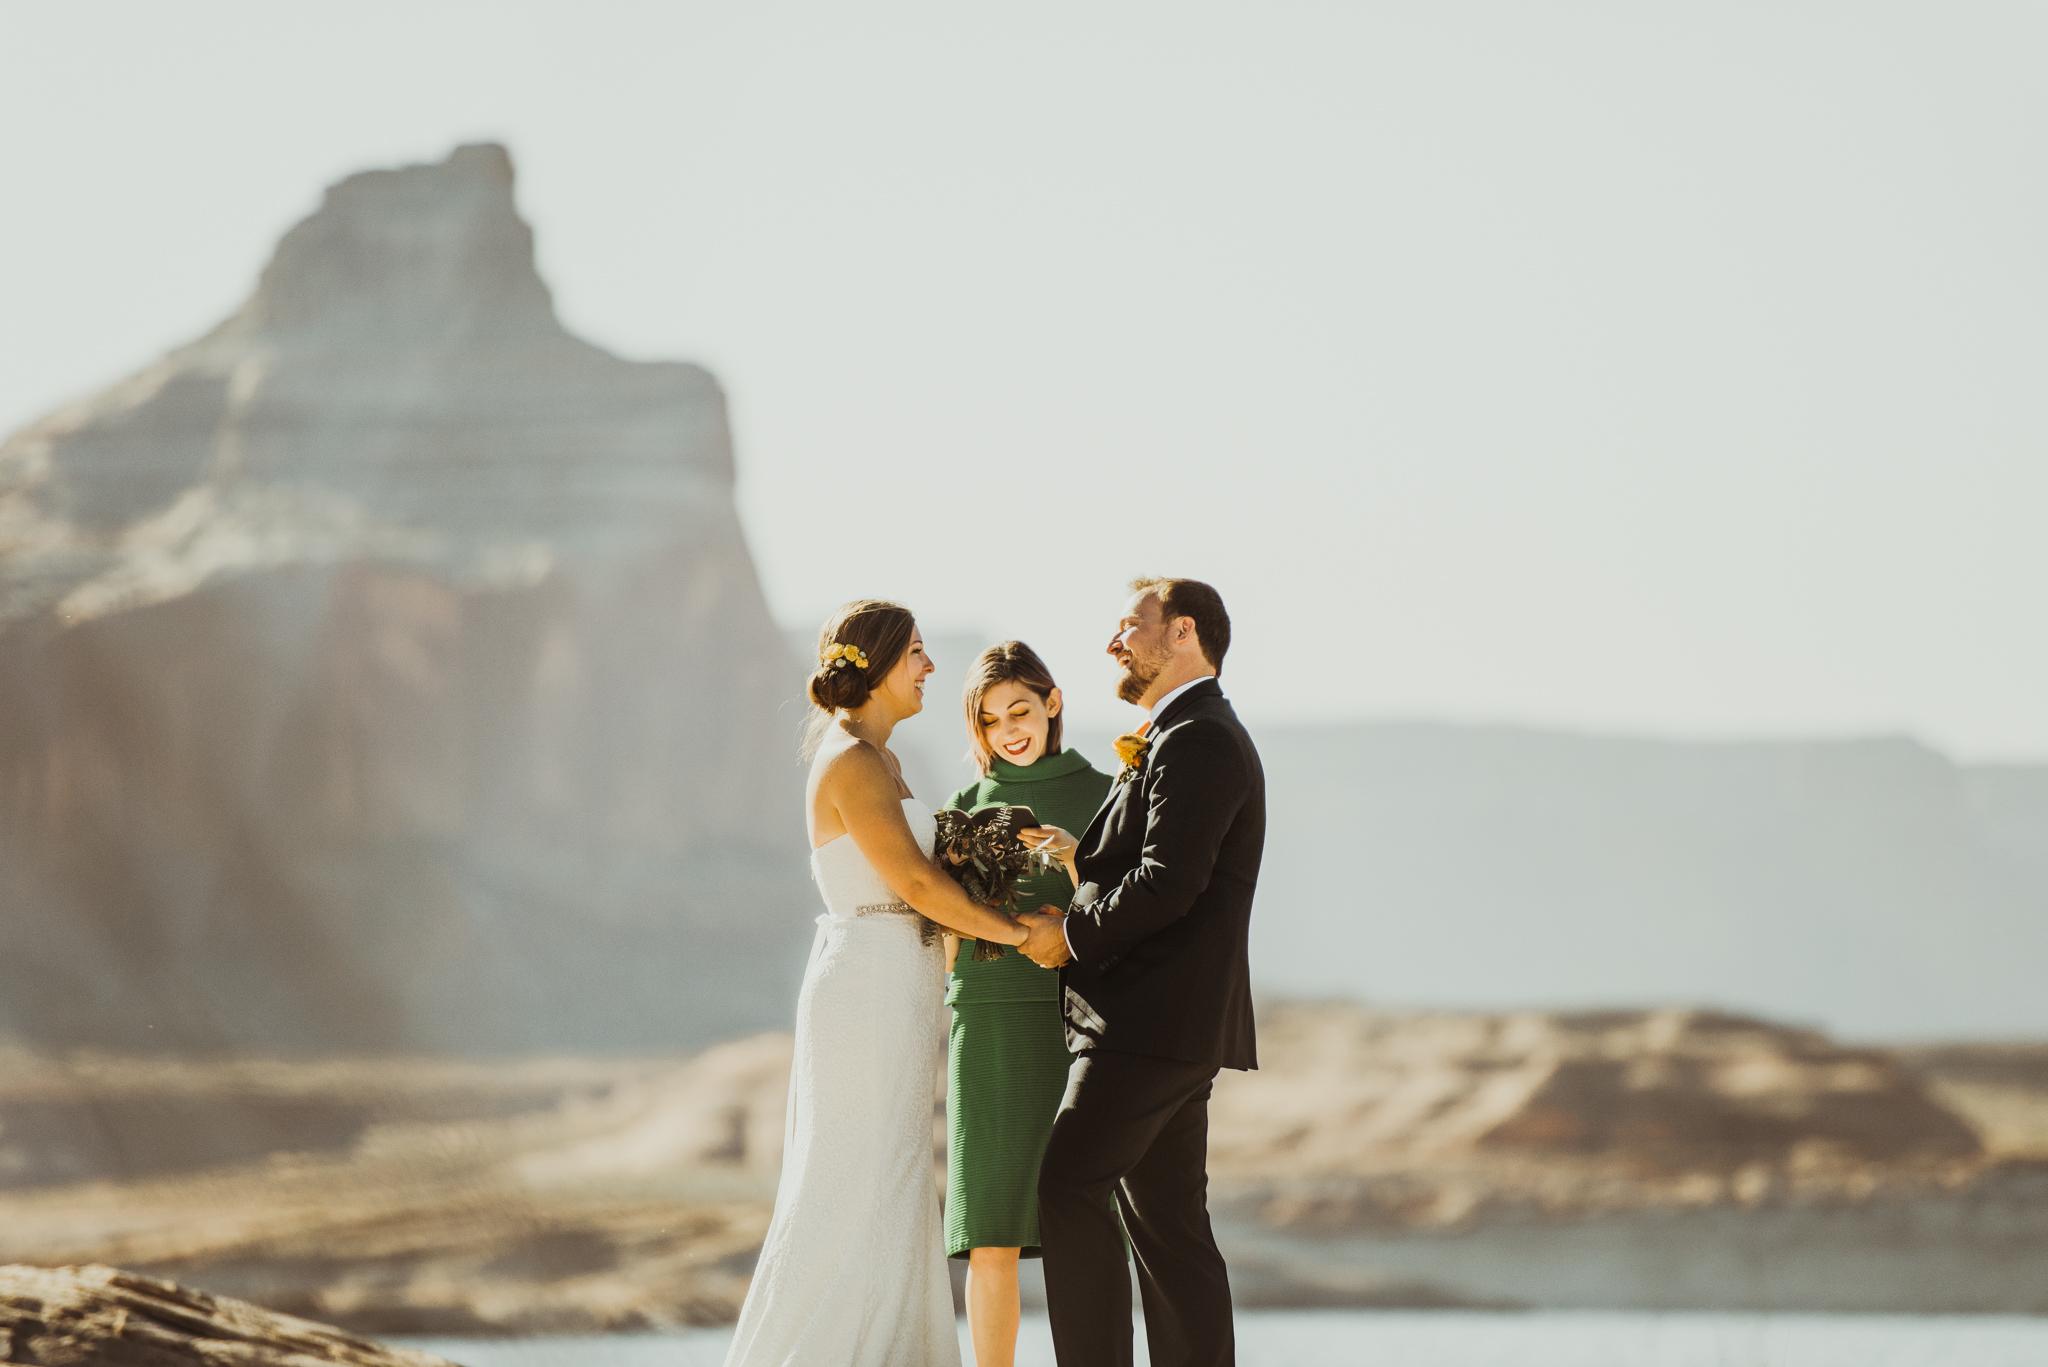 ©Isaiah + Taylor Photography - Lake Powell Elopement & Antelope Canyon & Horseshoe Bend, Page, Arizona-18.jpg